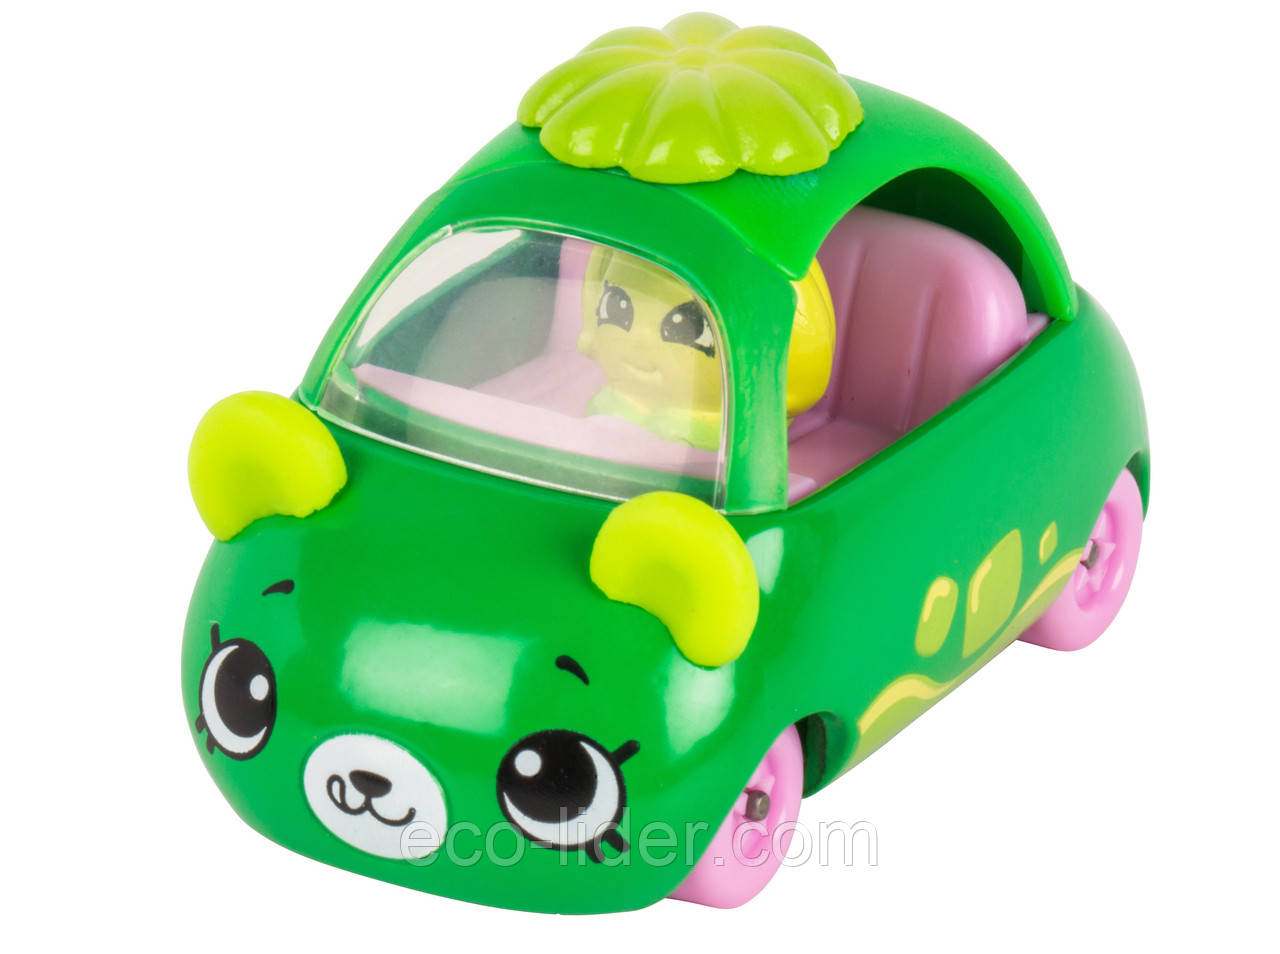 Мини-машинка SHOPKINS CUTIE CARS S1 - ЛОВКОЕ ЖЕЛЕ (с мини-шопкинсом)